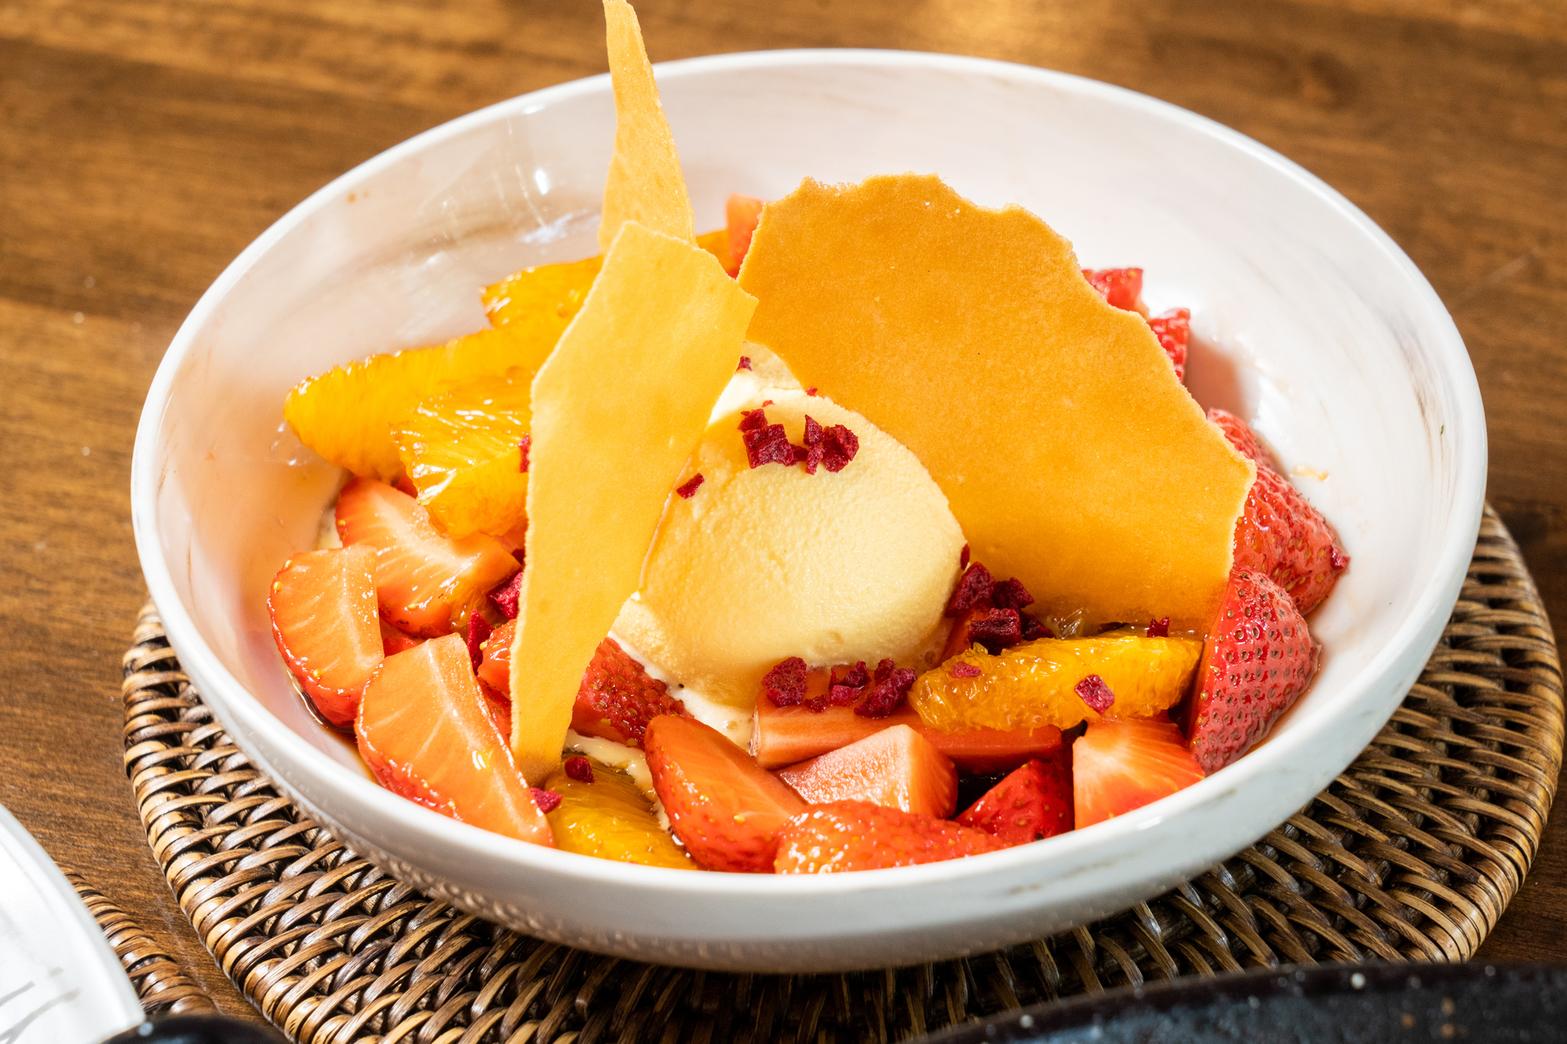 Dessert from Arroz Spanish Rice House at 112 Sukhumvit 53 Klongtan-Nua Wattana, Bangkok